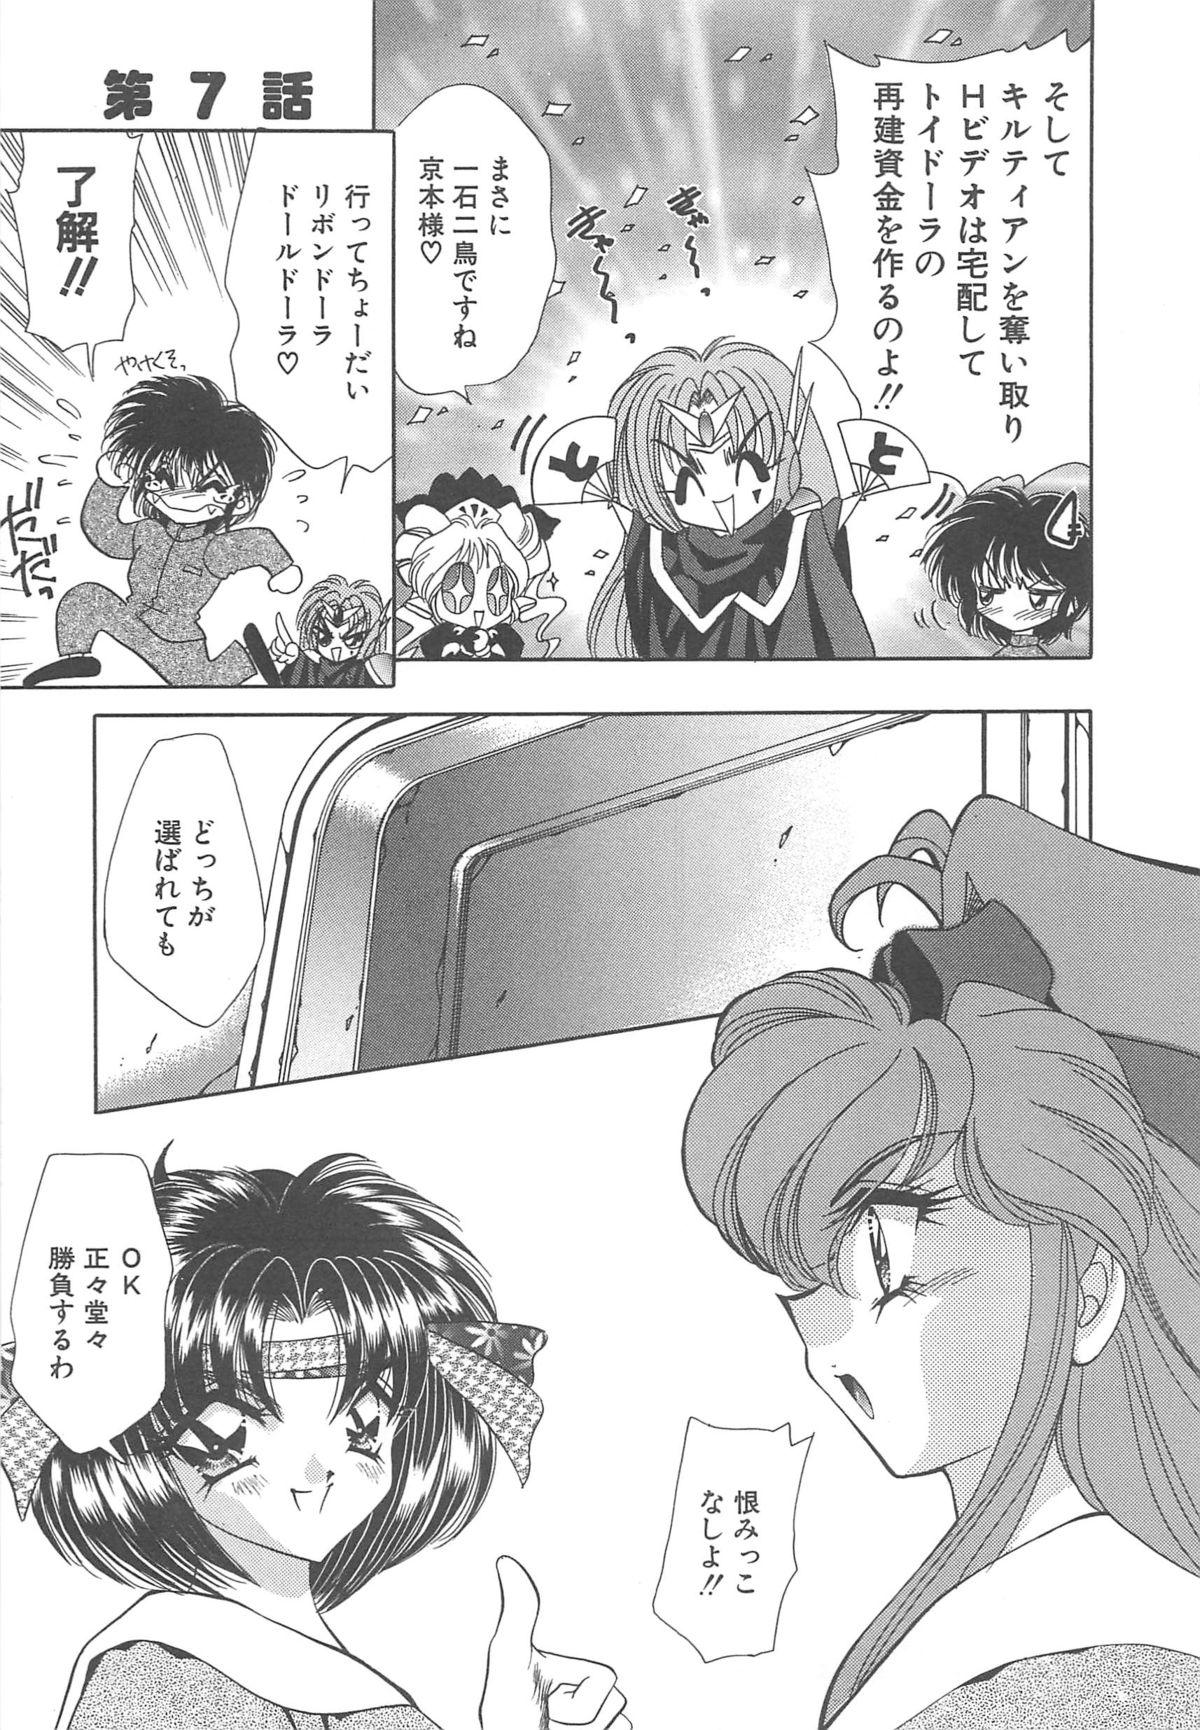 Kigurumi Sentai Quiltian 113